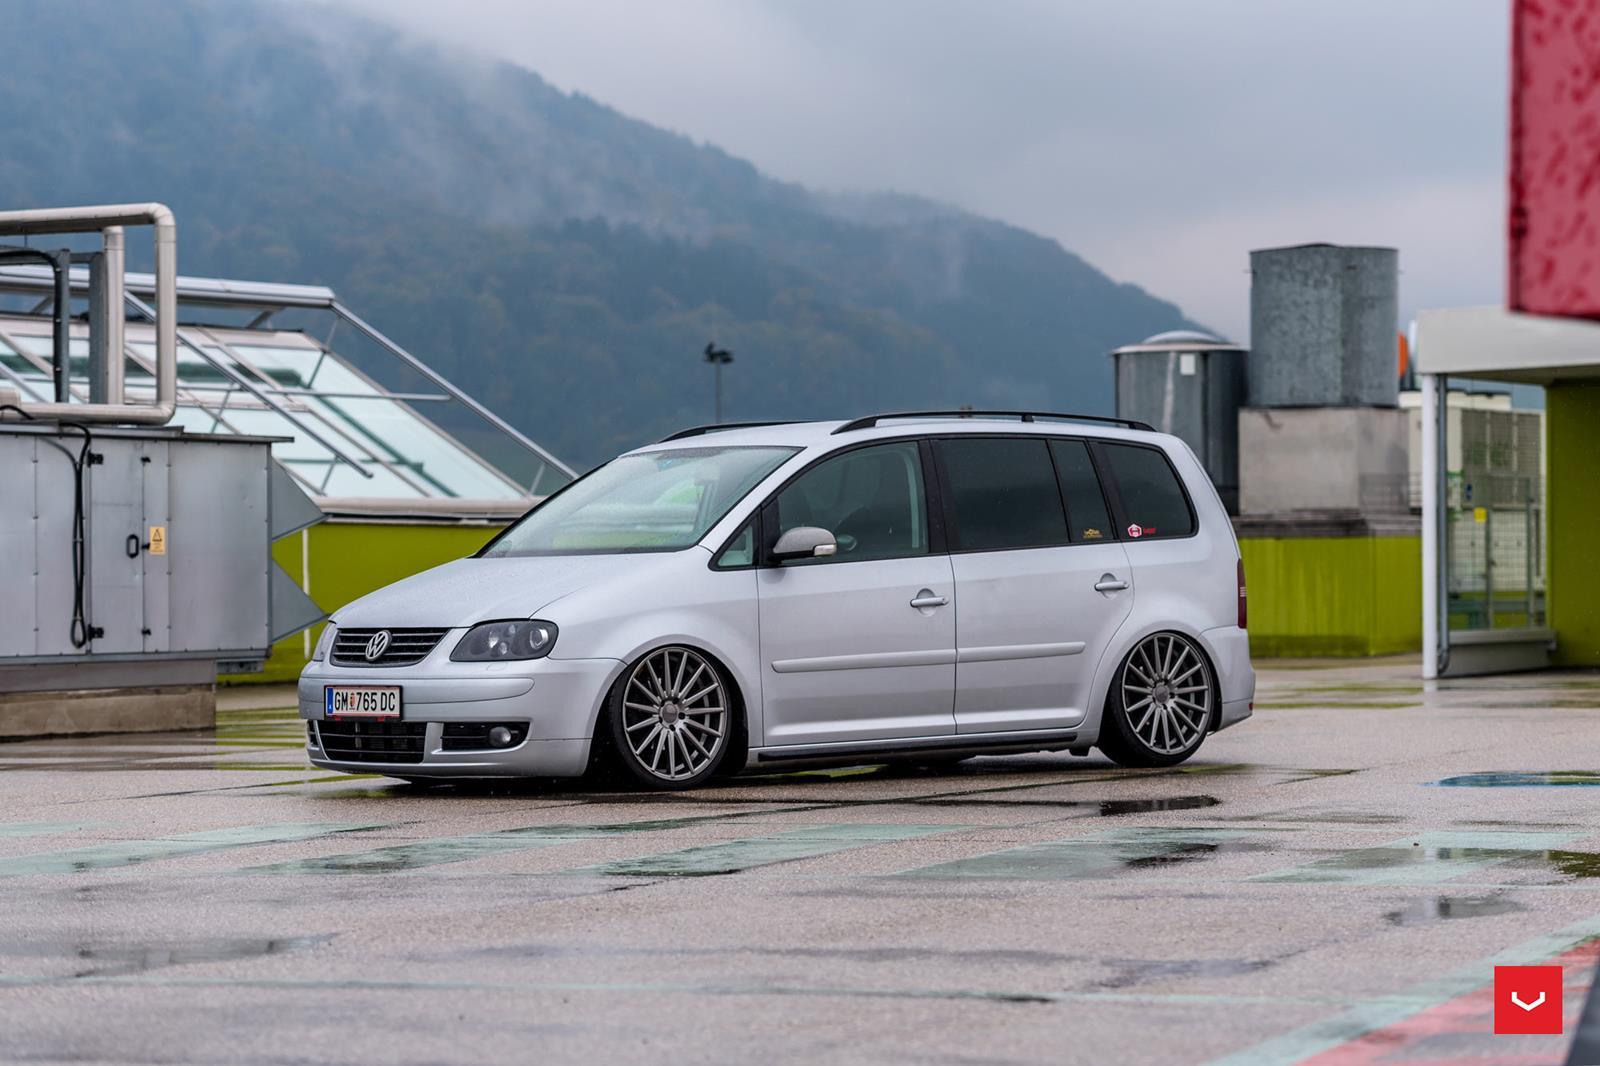 Jetta Mk6 Tuning >> VW Touran tuning pictures